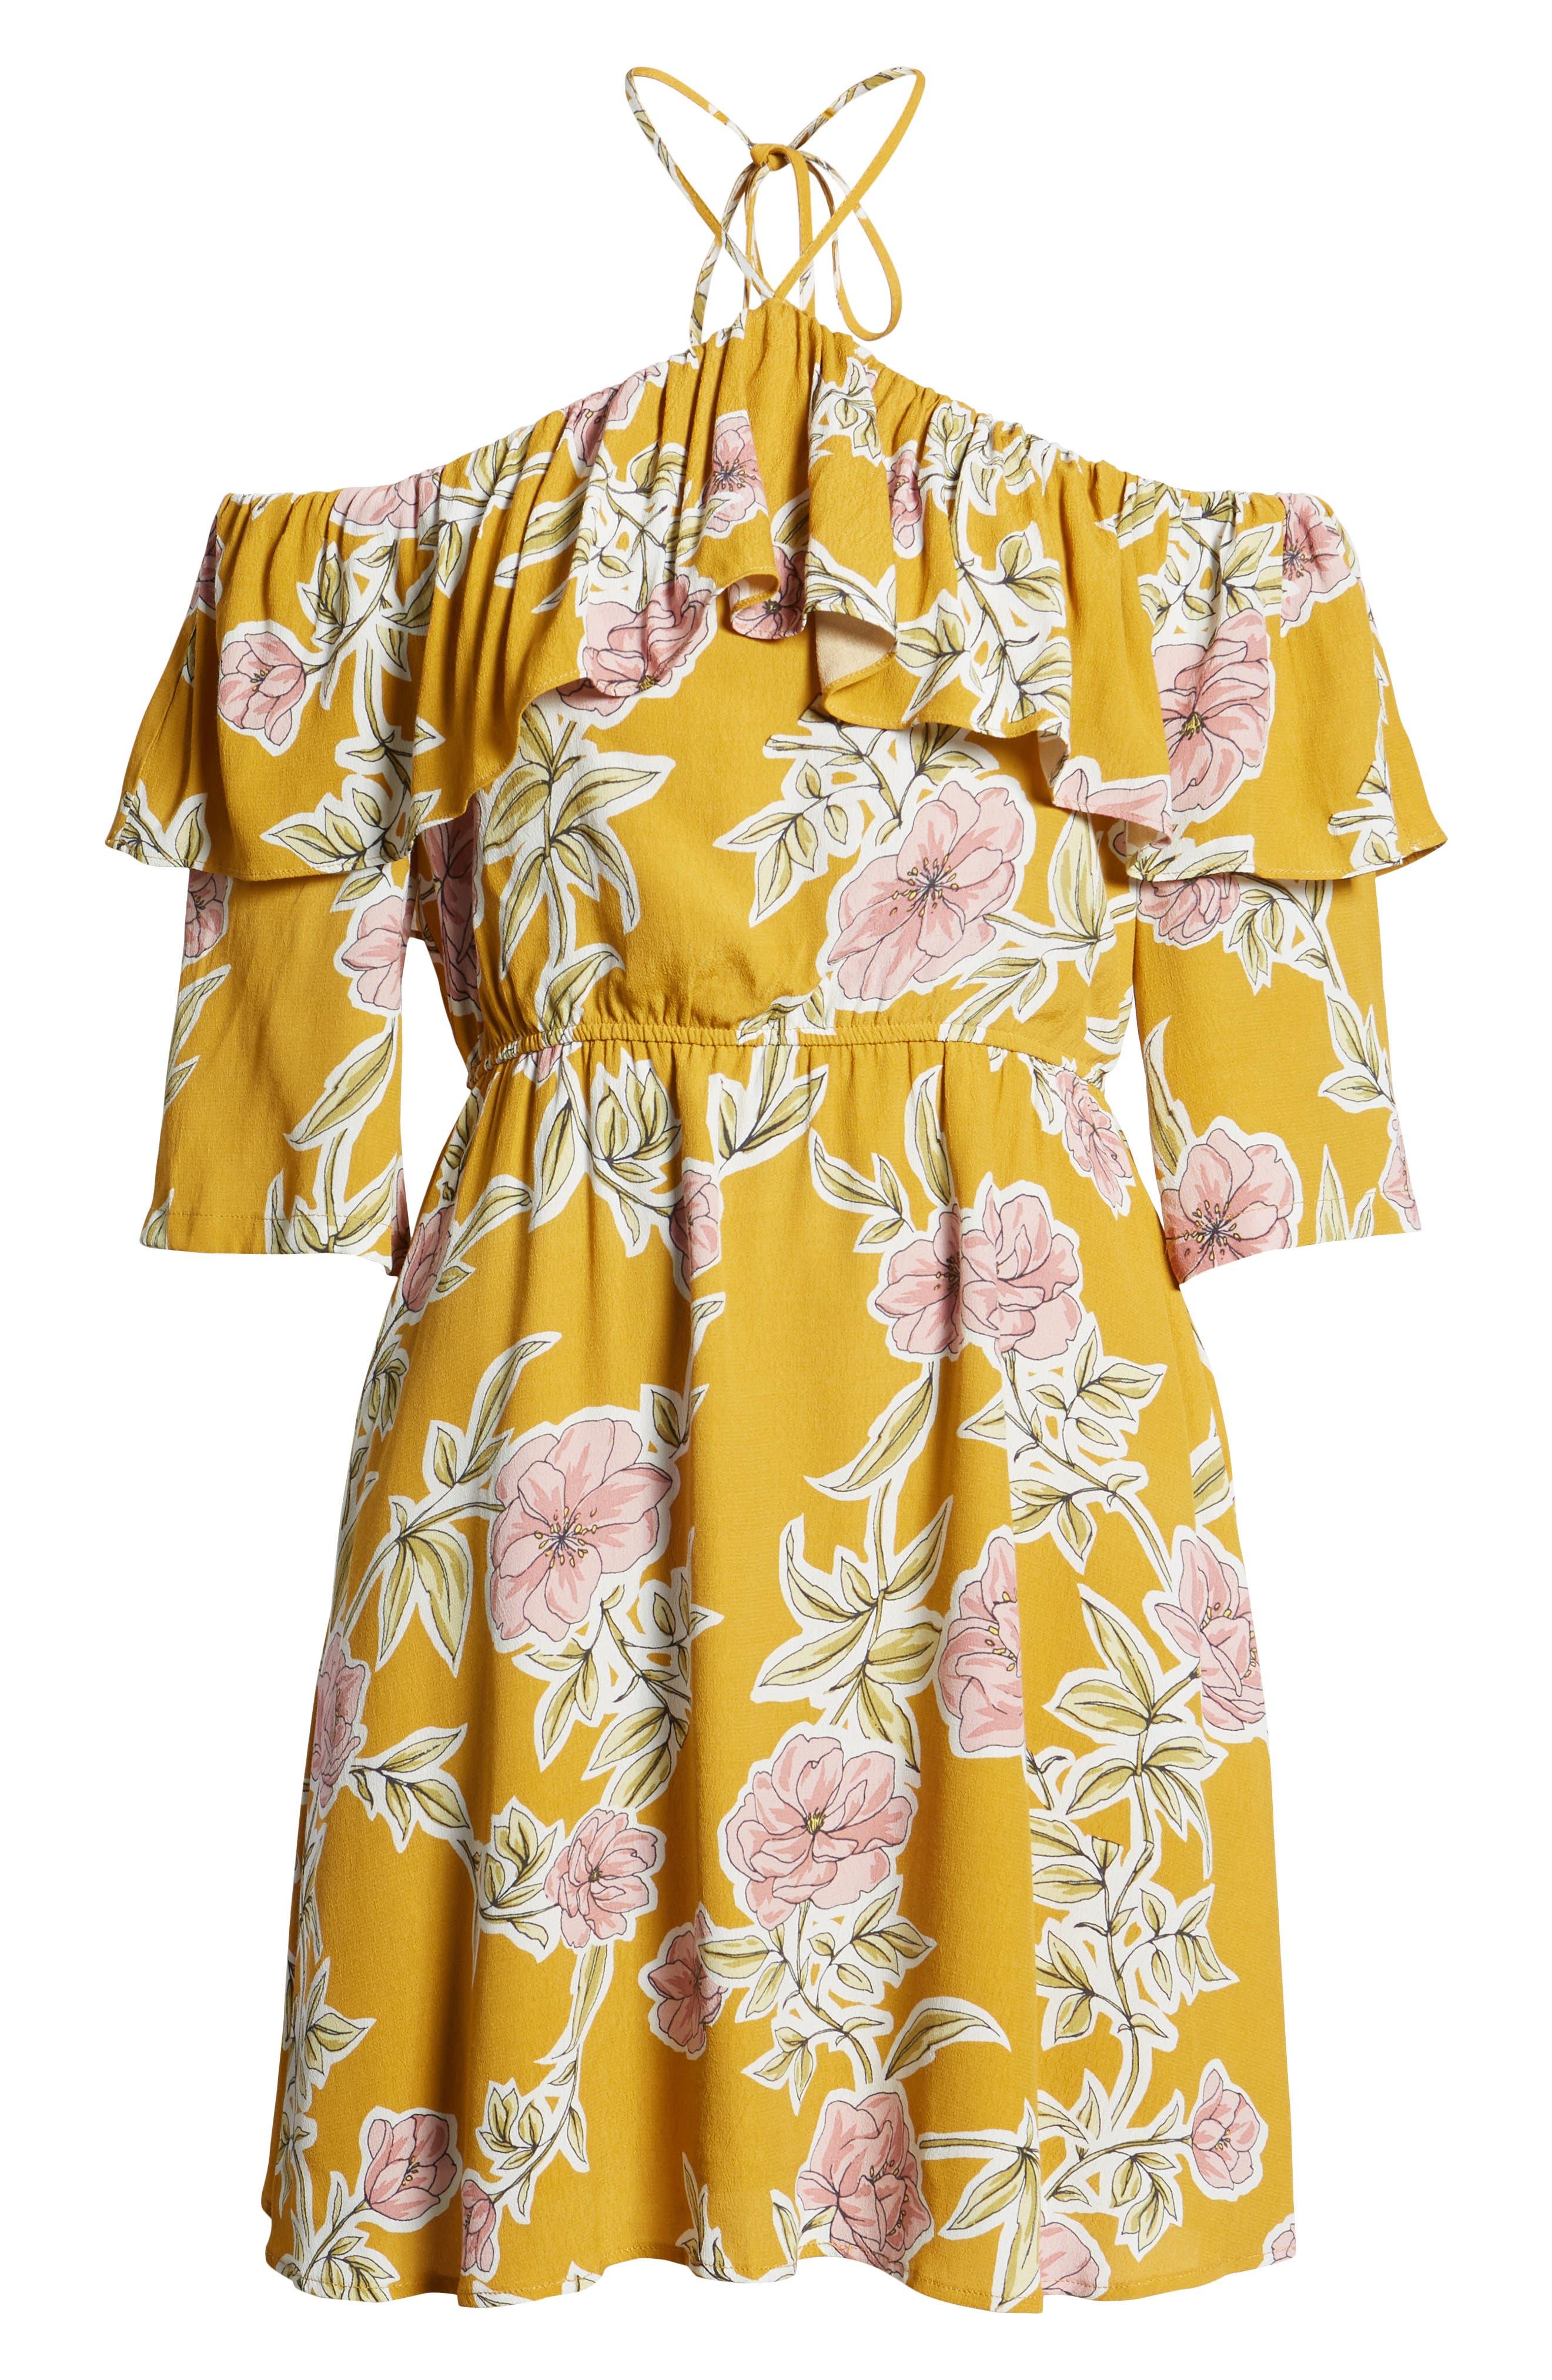 Fonda Cold Shoulder Halter Dress,                             Alternate thumbnail 7, color,                             Yellow Gold